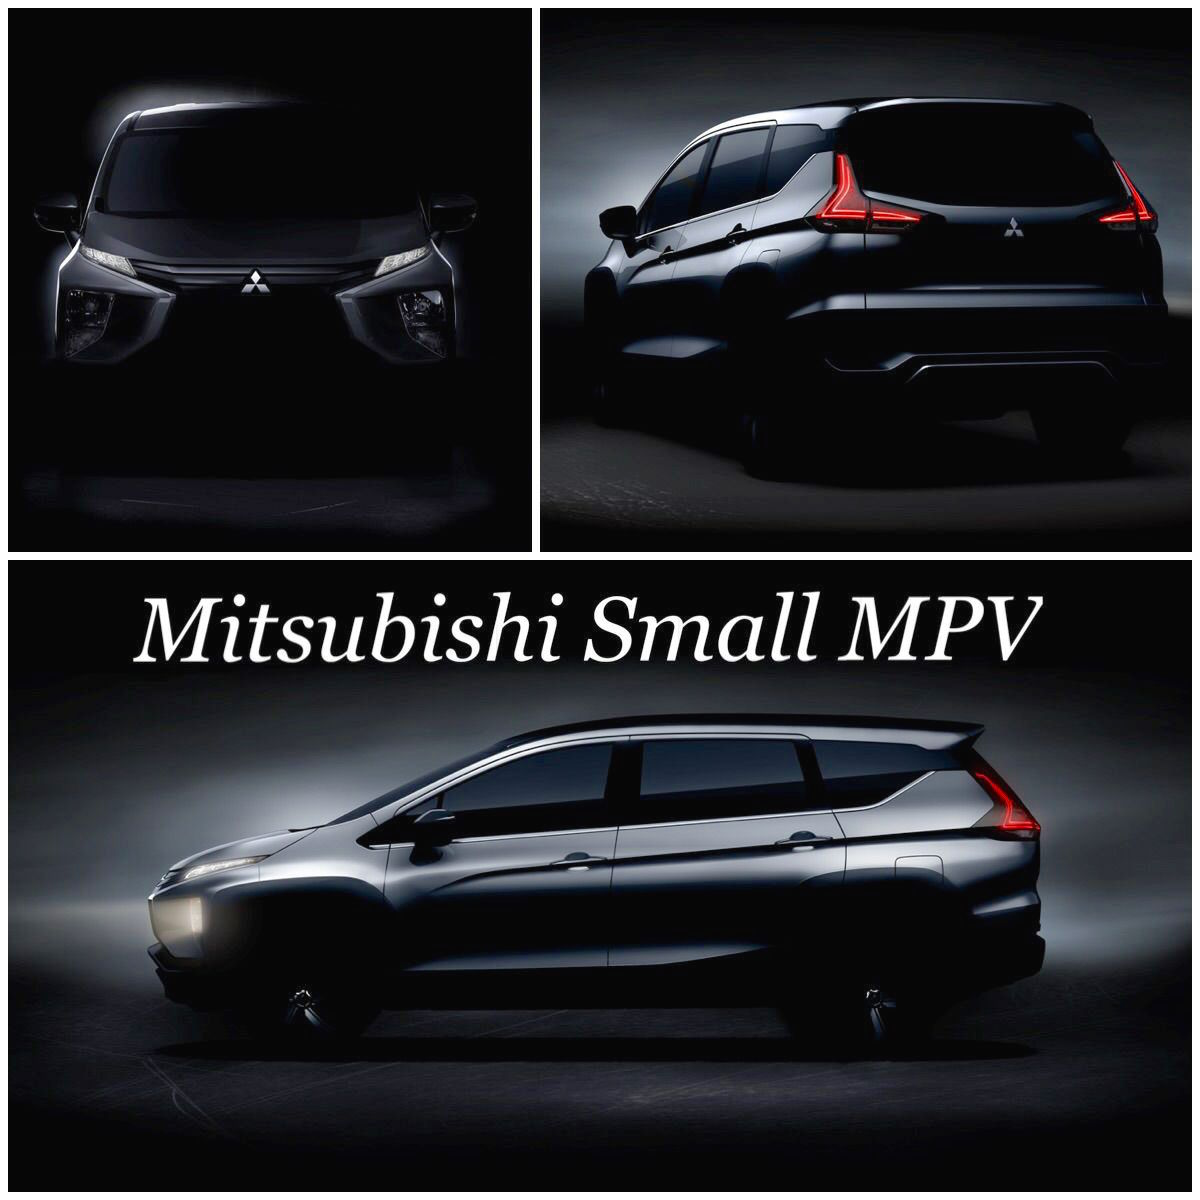 mpv-7-cho-mitsubishi-expander-sap-trinh-lang-co-gi-dac-biet